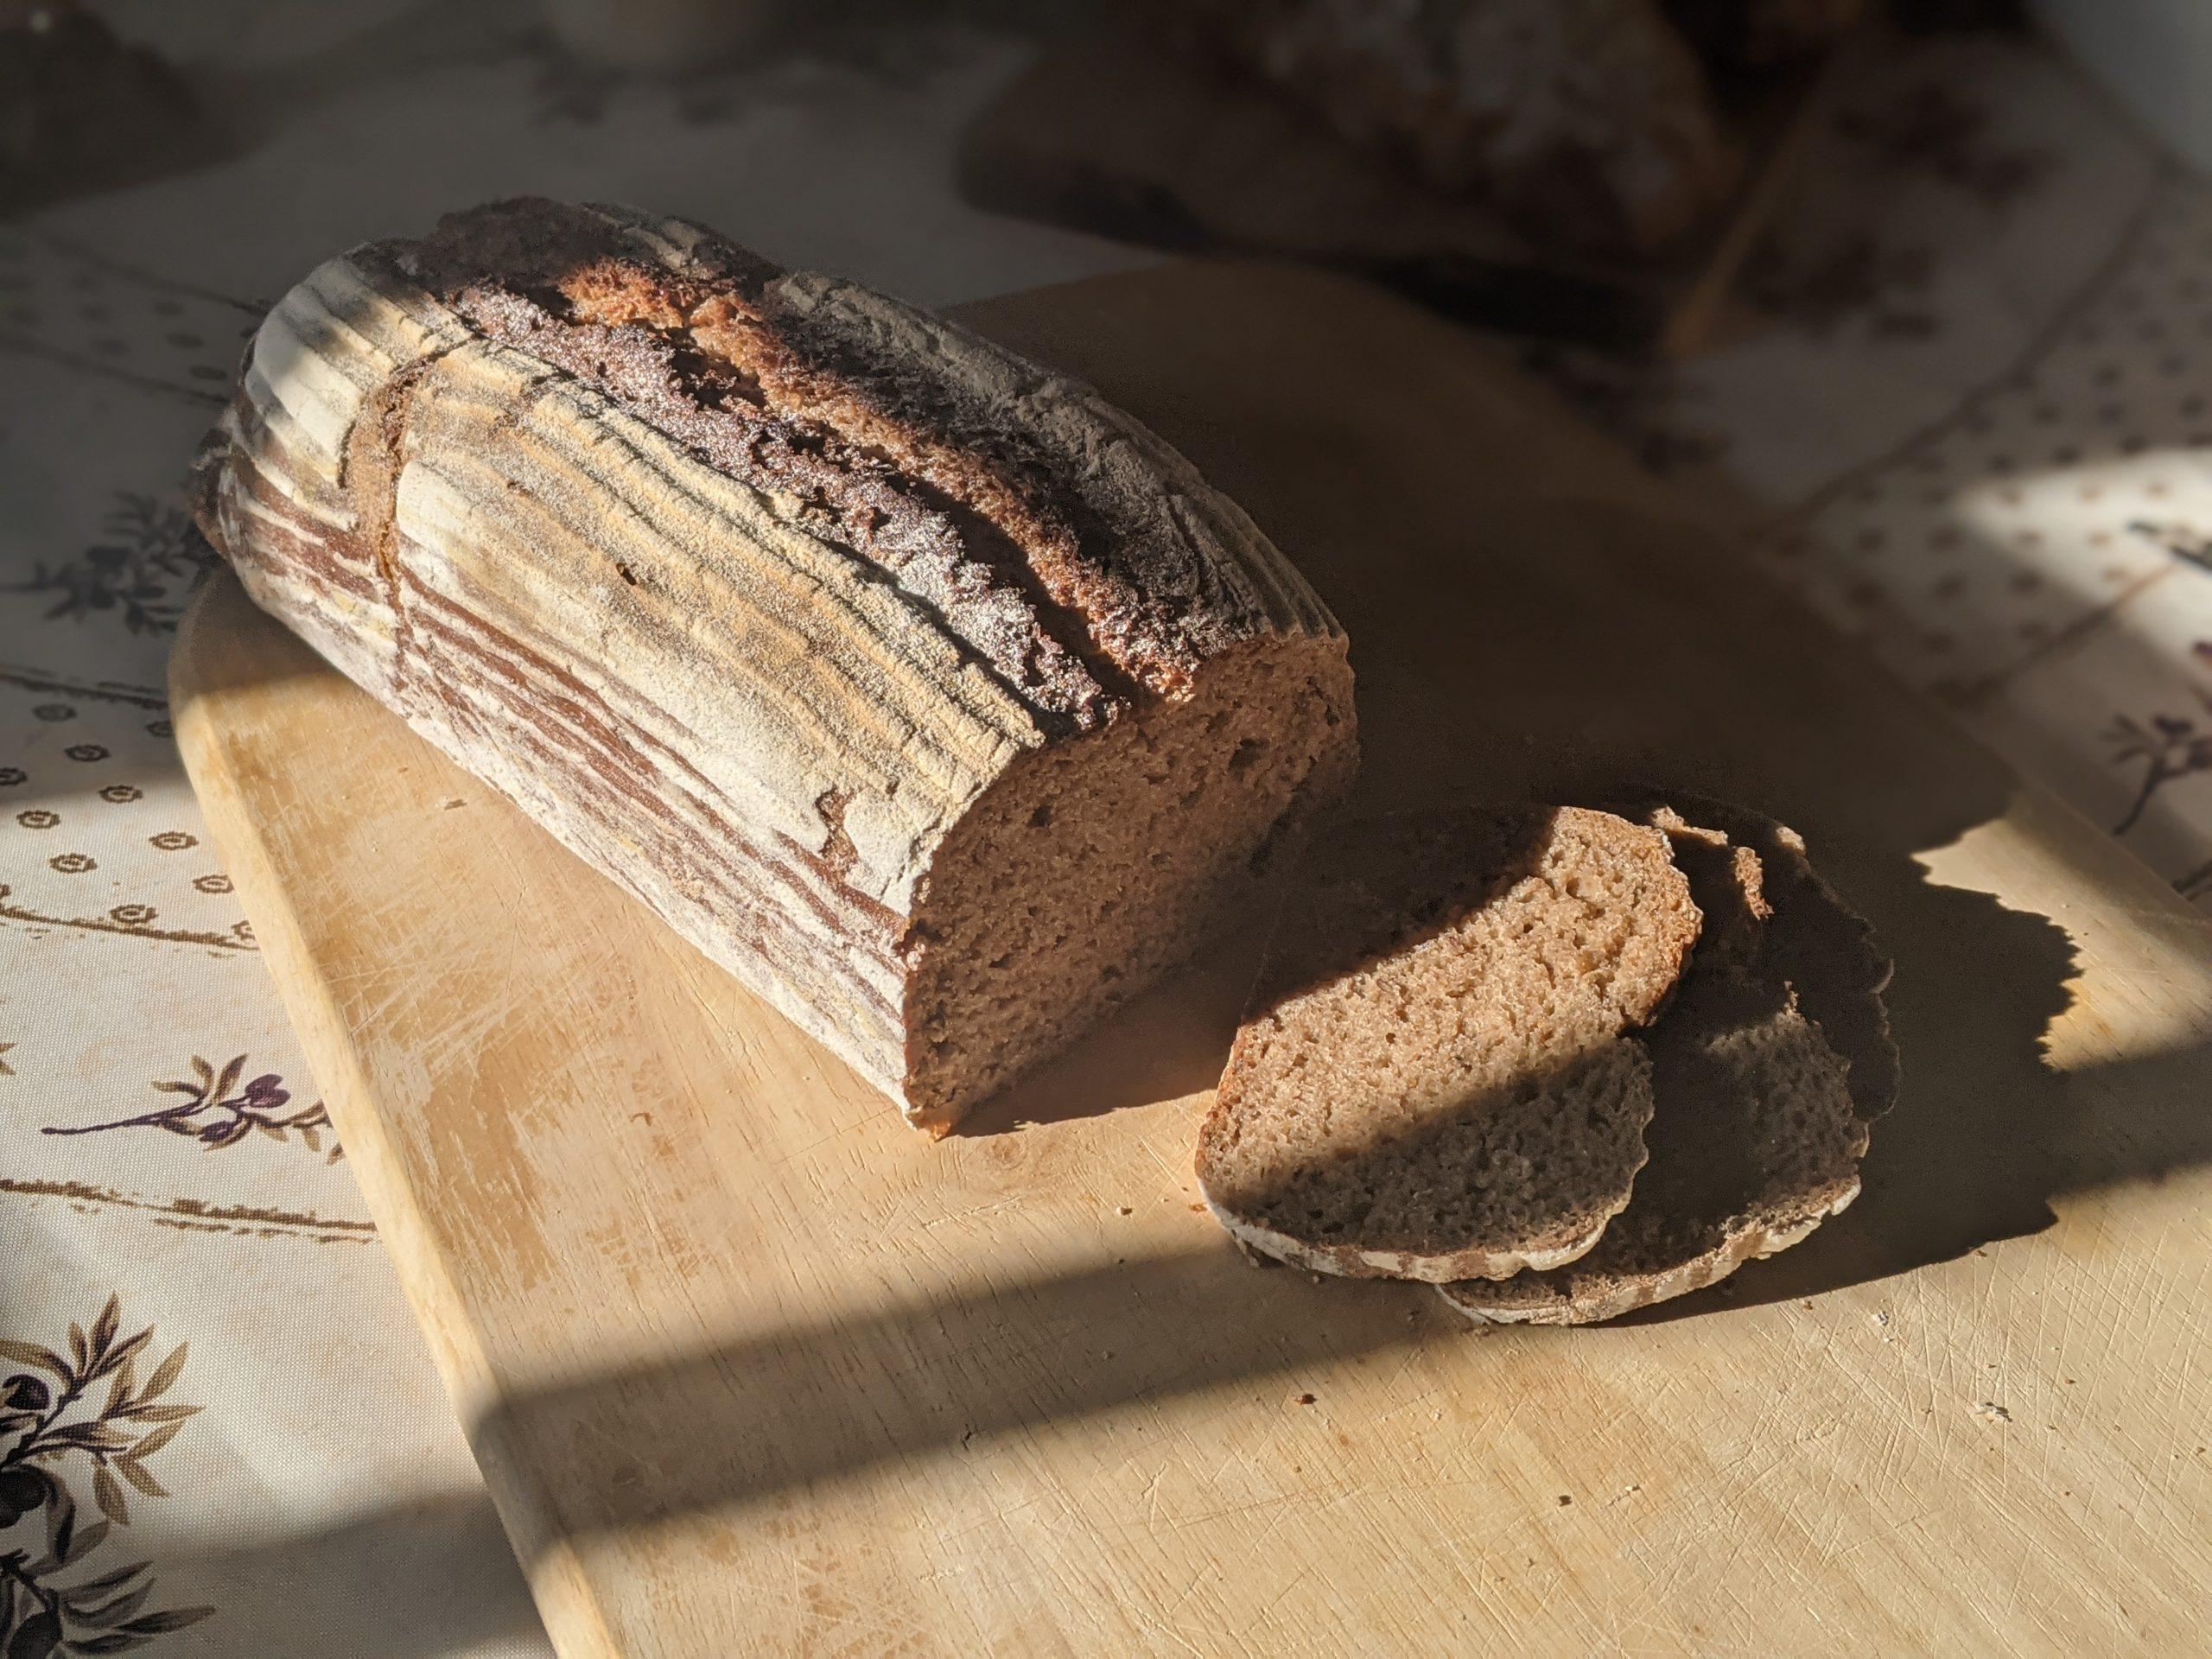 Wir backen Brot!